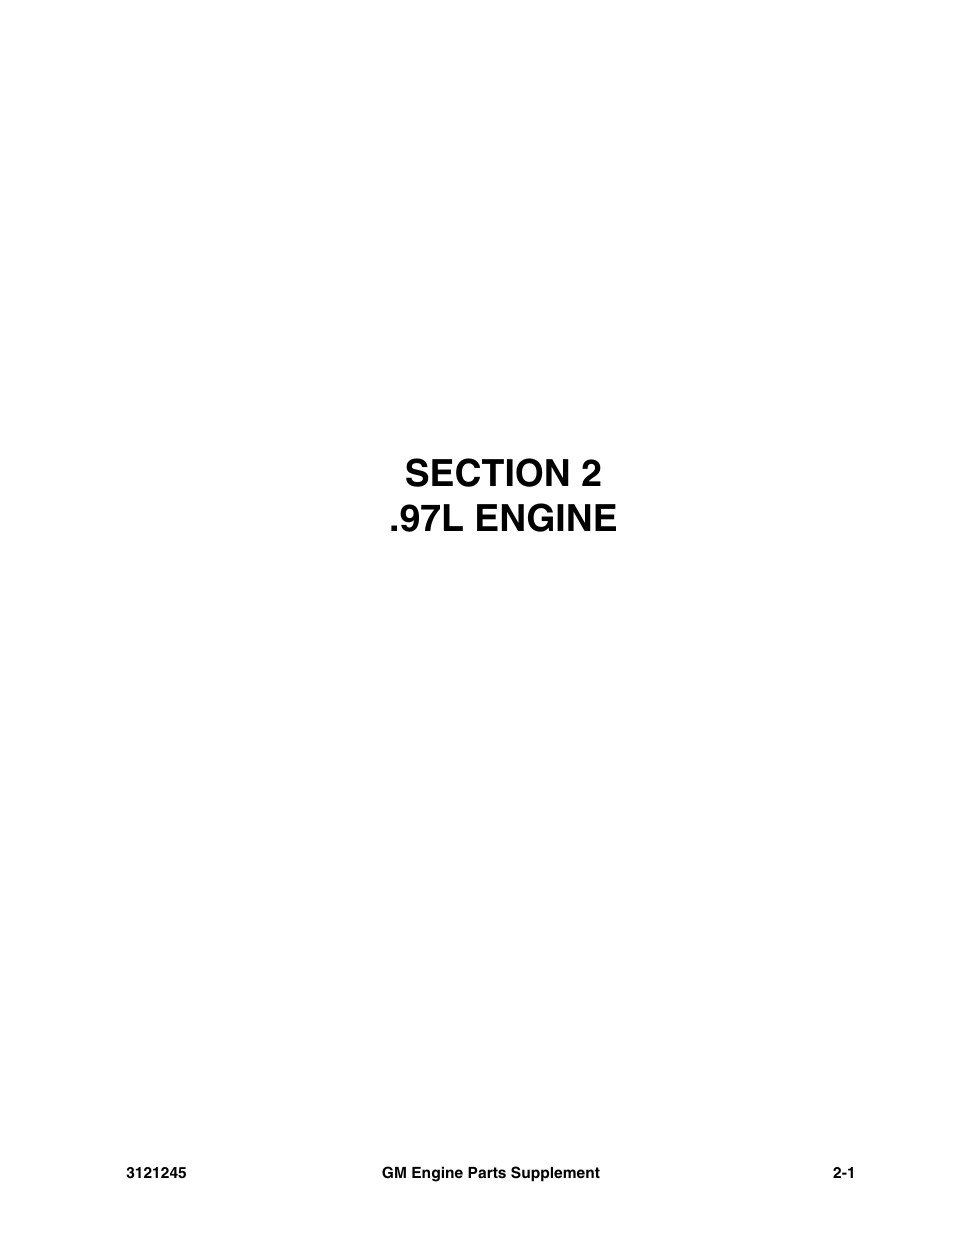 Section 2 97l Engine L 1 Jlg Gm Parts Diagram Supplements User Manual Page 9 100